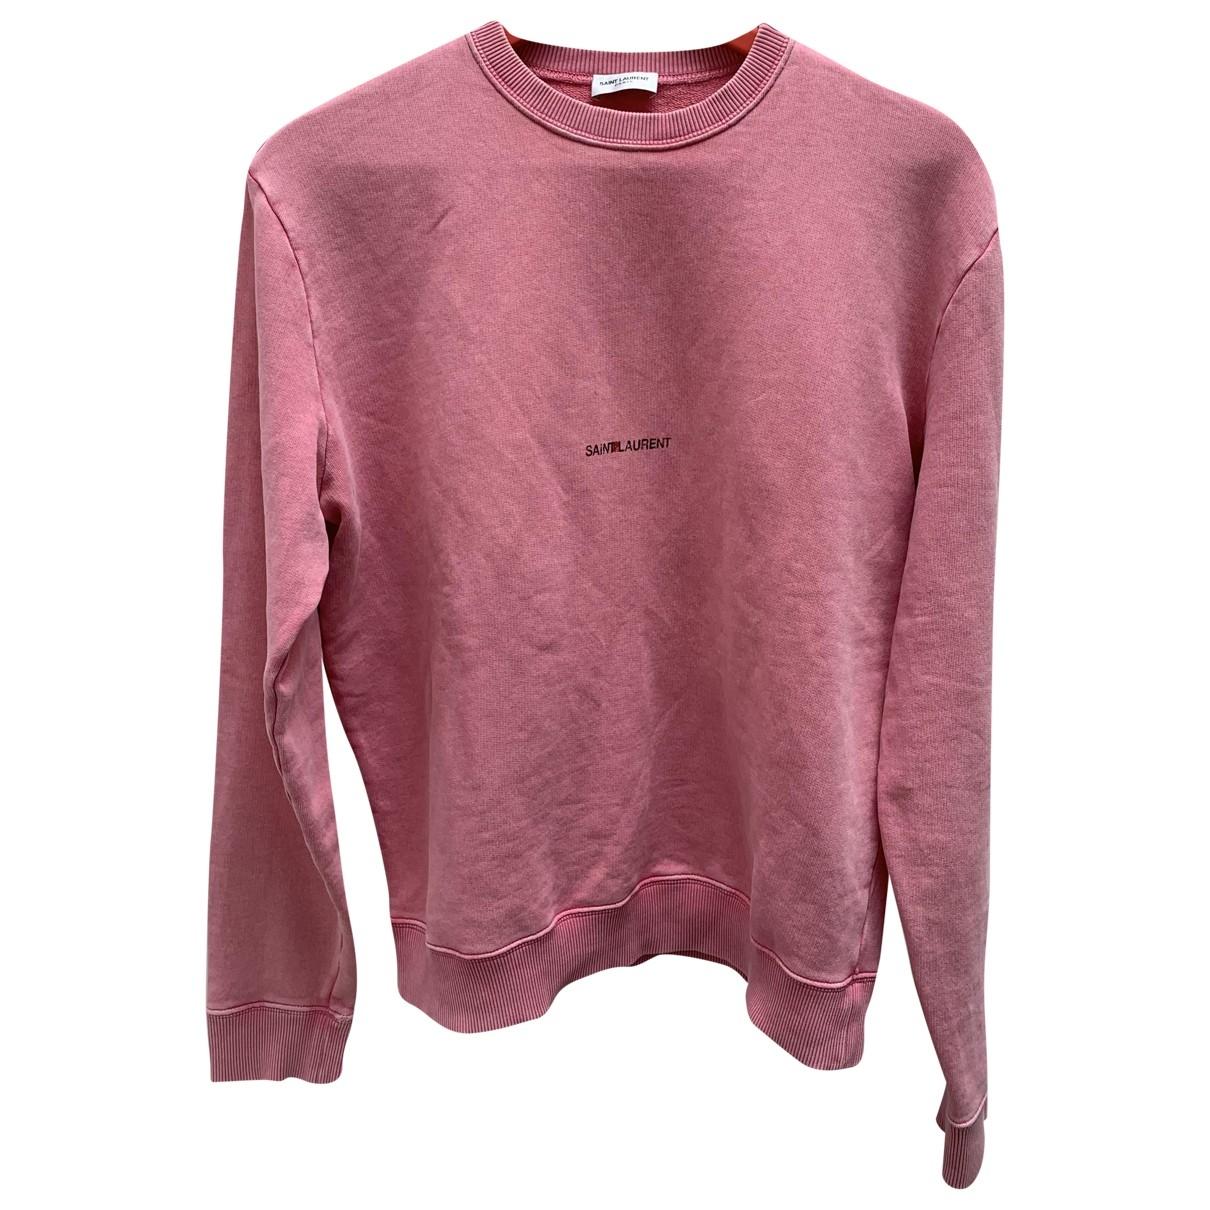 Saint Laurent \N Pink Cotton Knitwear for Women M International